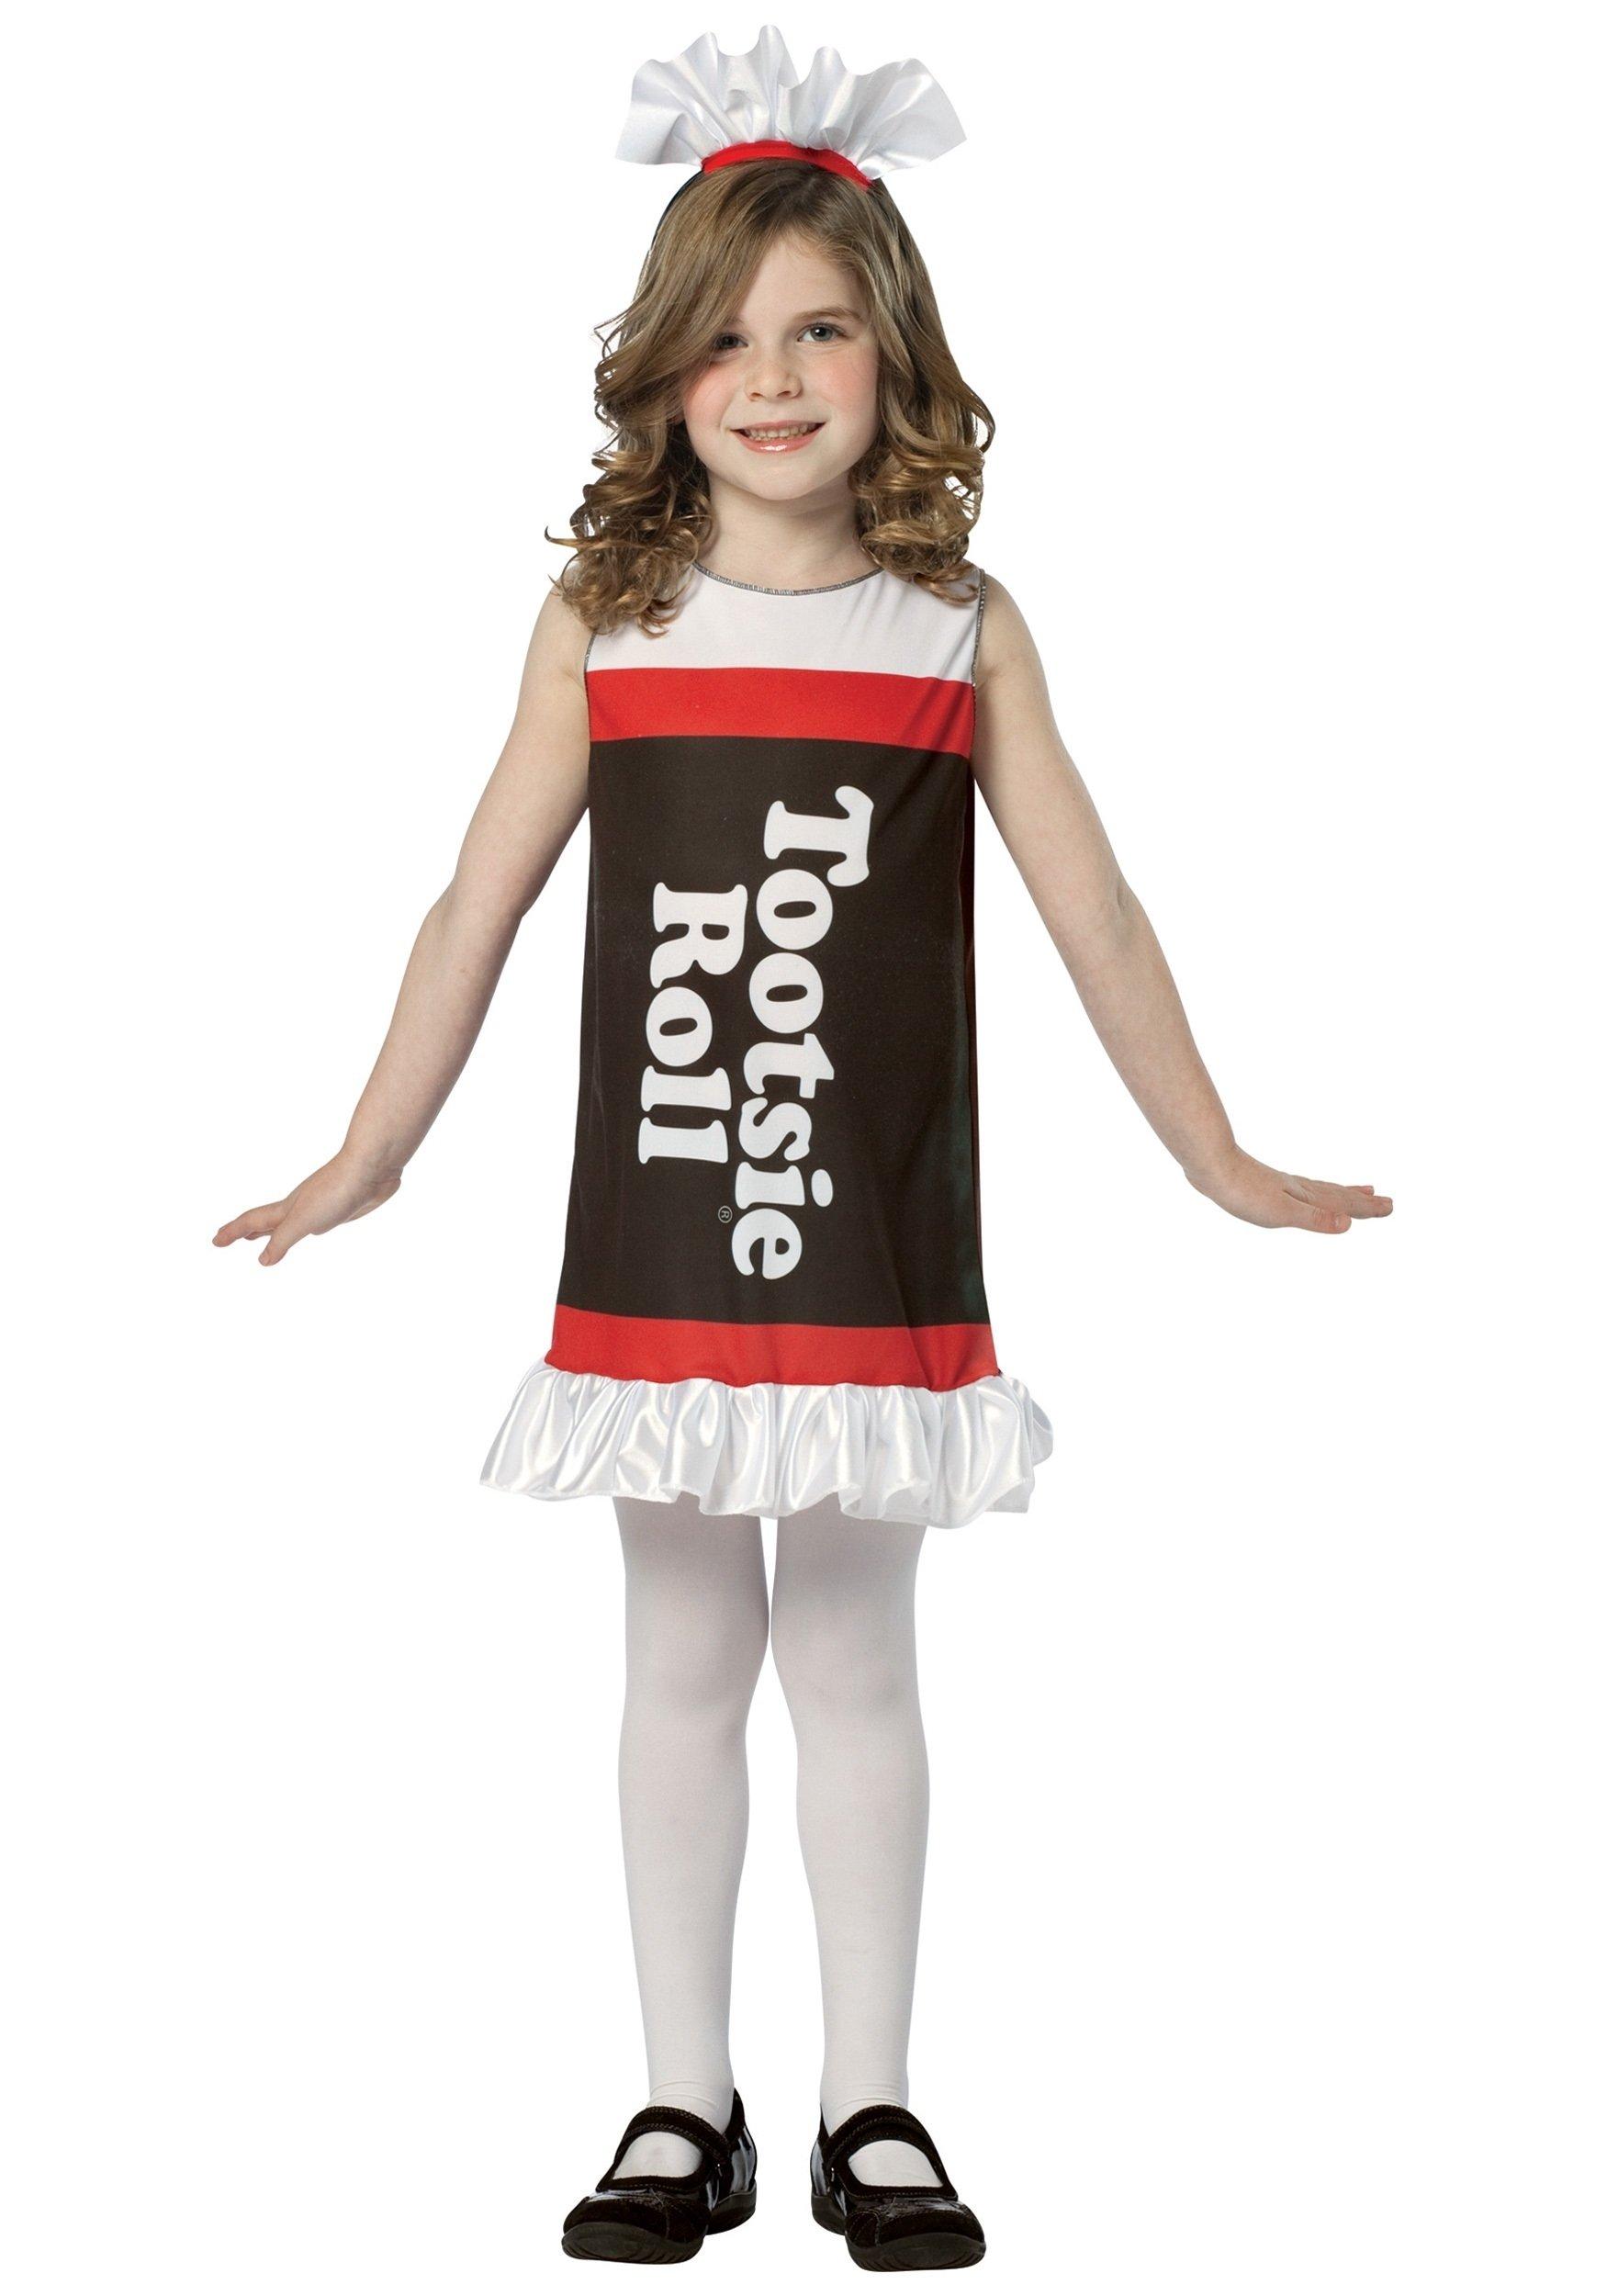 10 Beautiful Funny Female Halloween Costume Ideas girls tootsie roll dress 6 2020